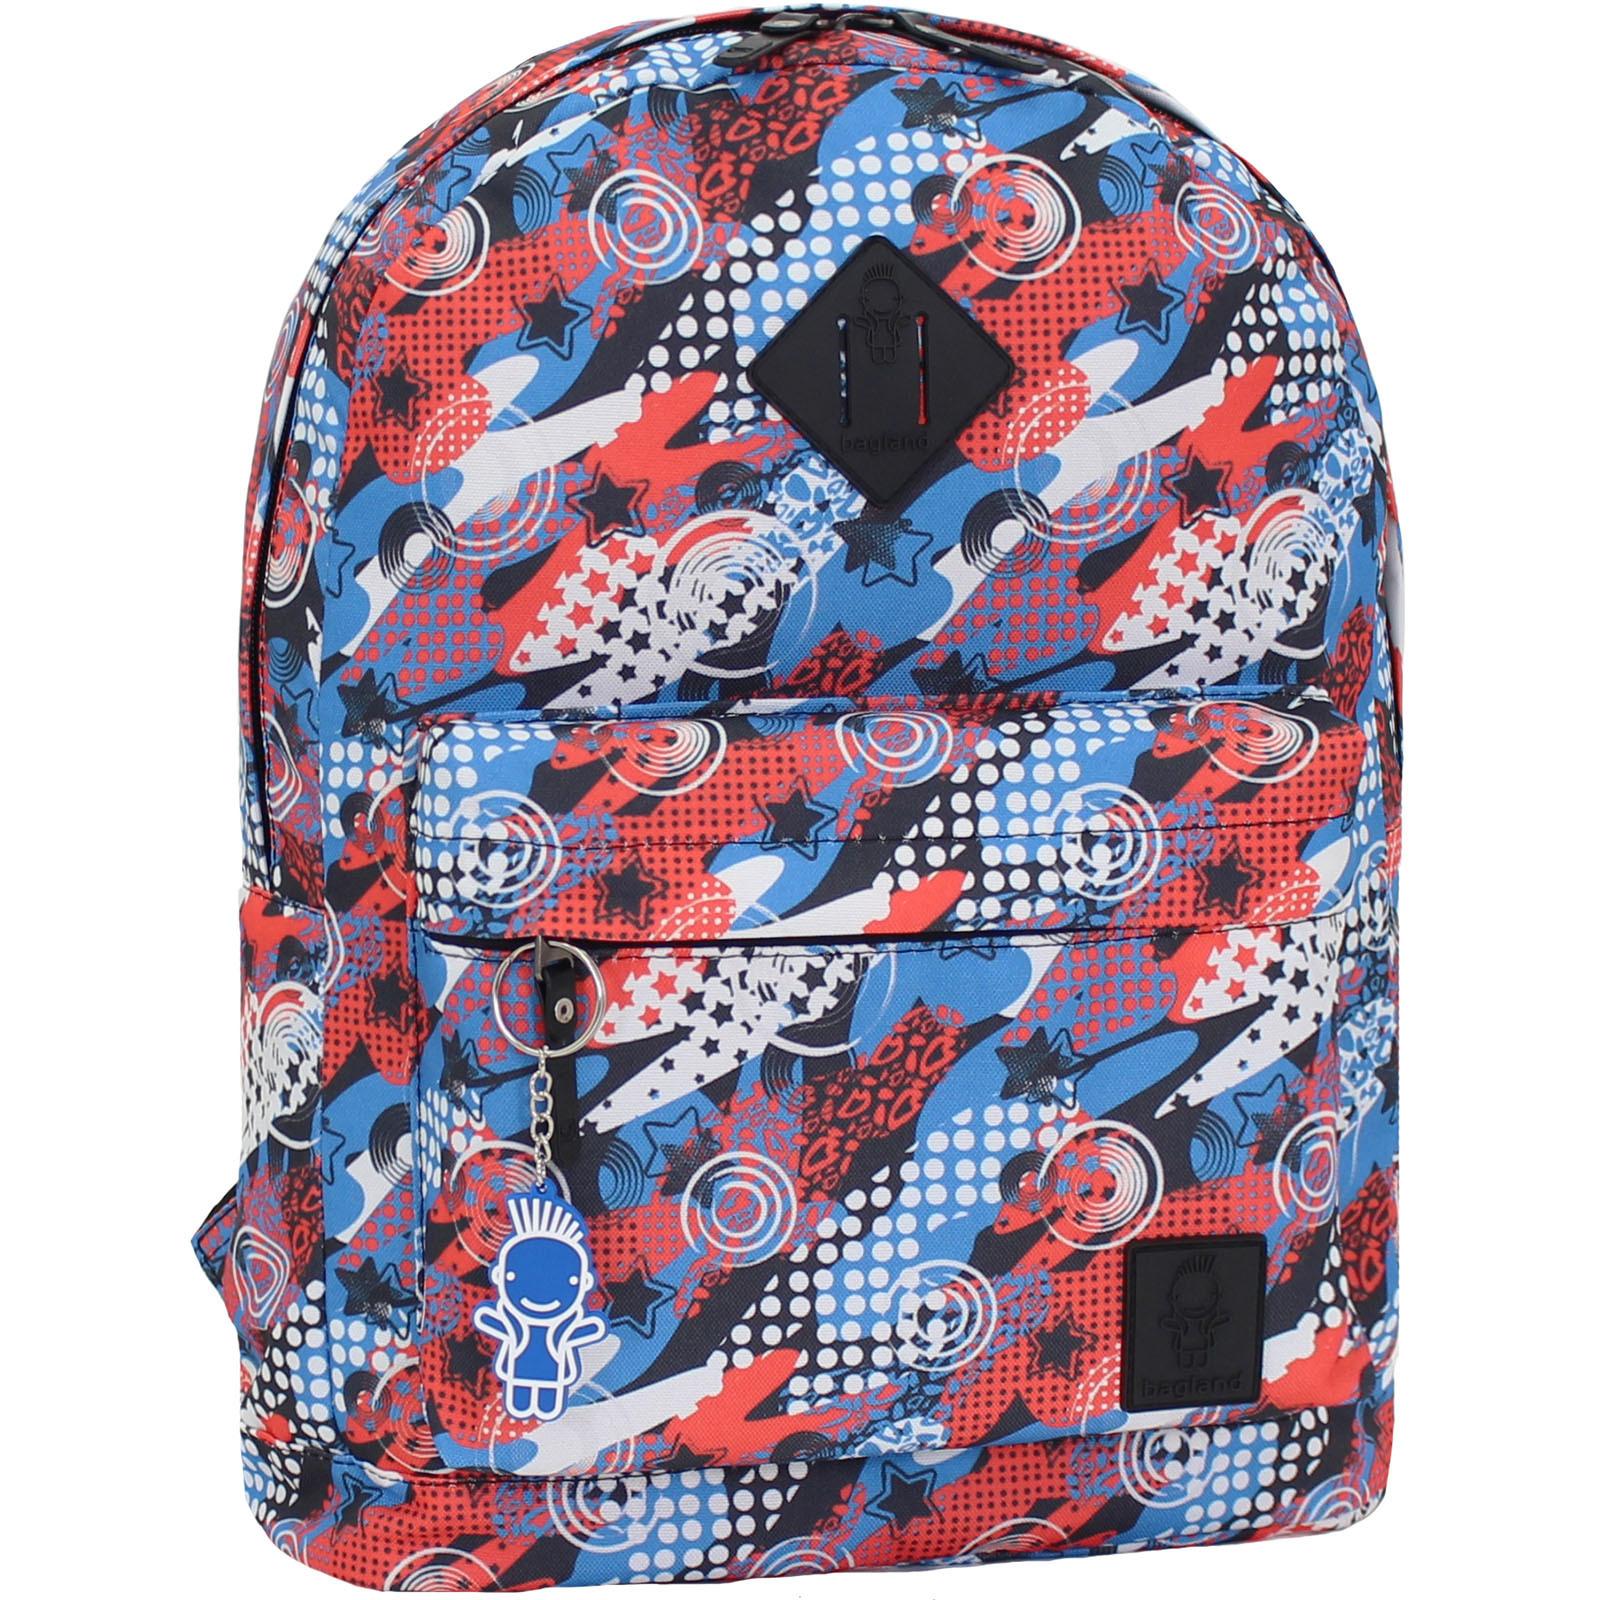 Рюкзак Bagland Молодежный (дизайн) 17 л. сублимация 288 (00533664)